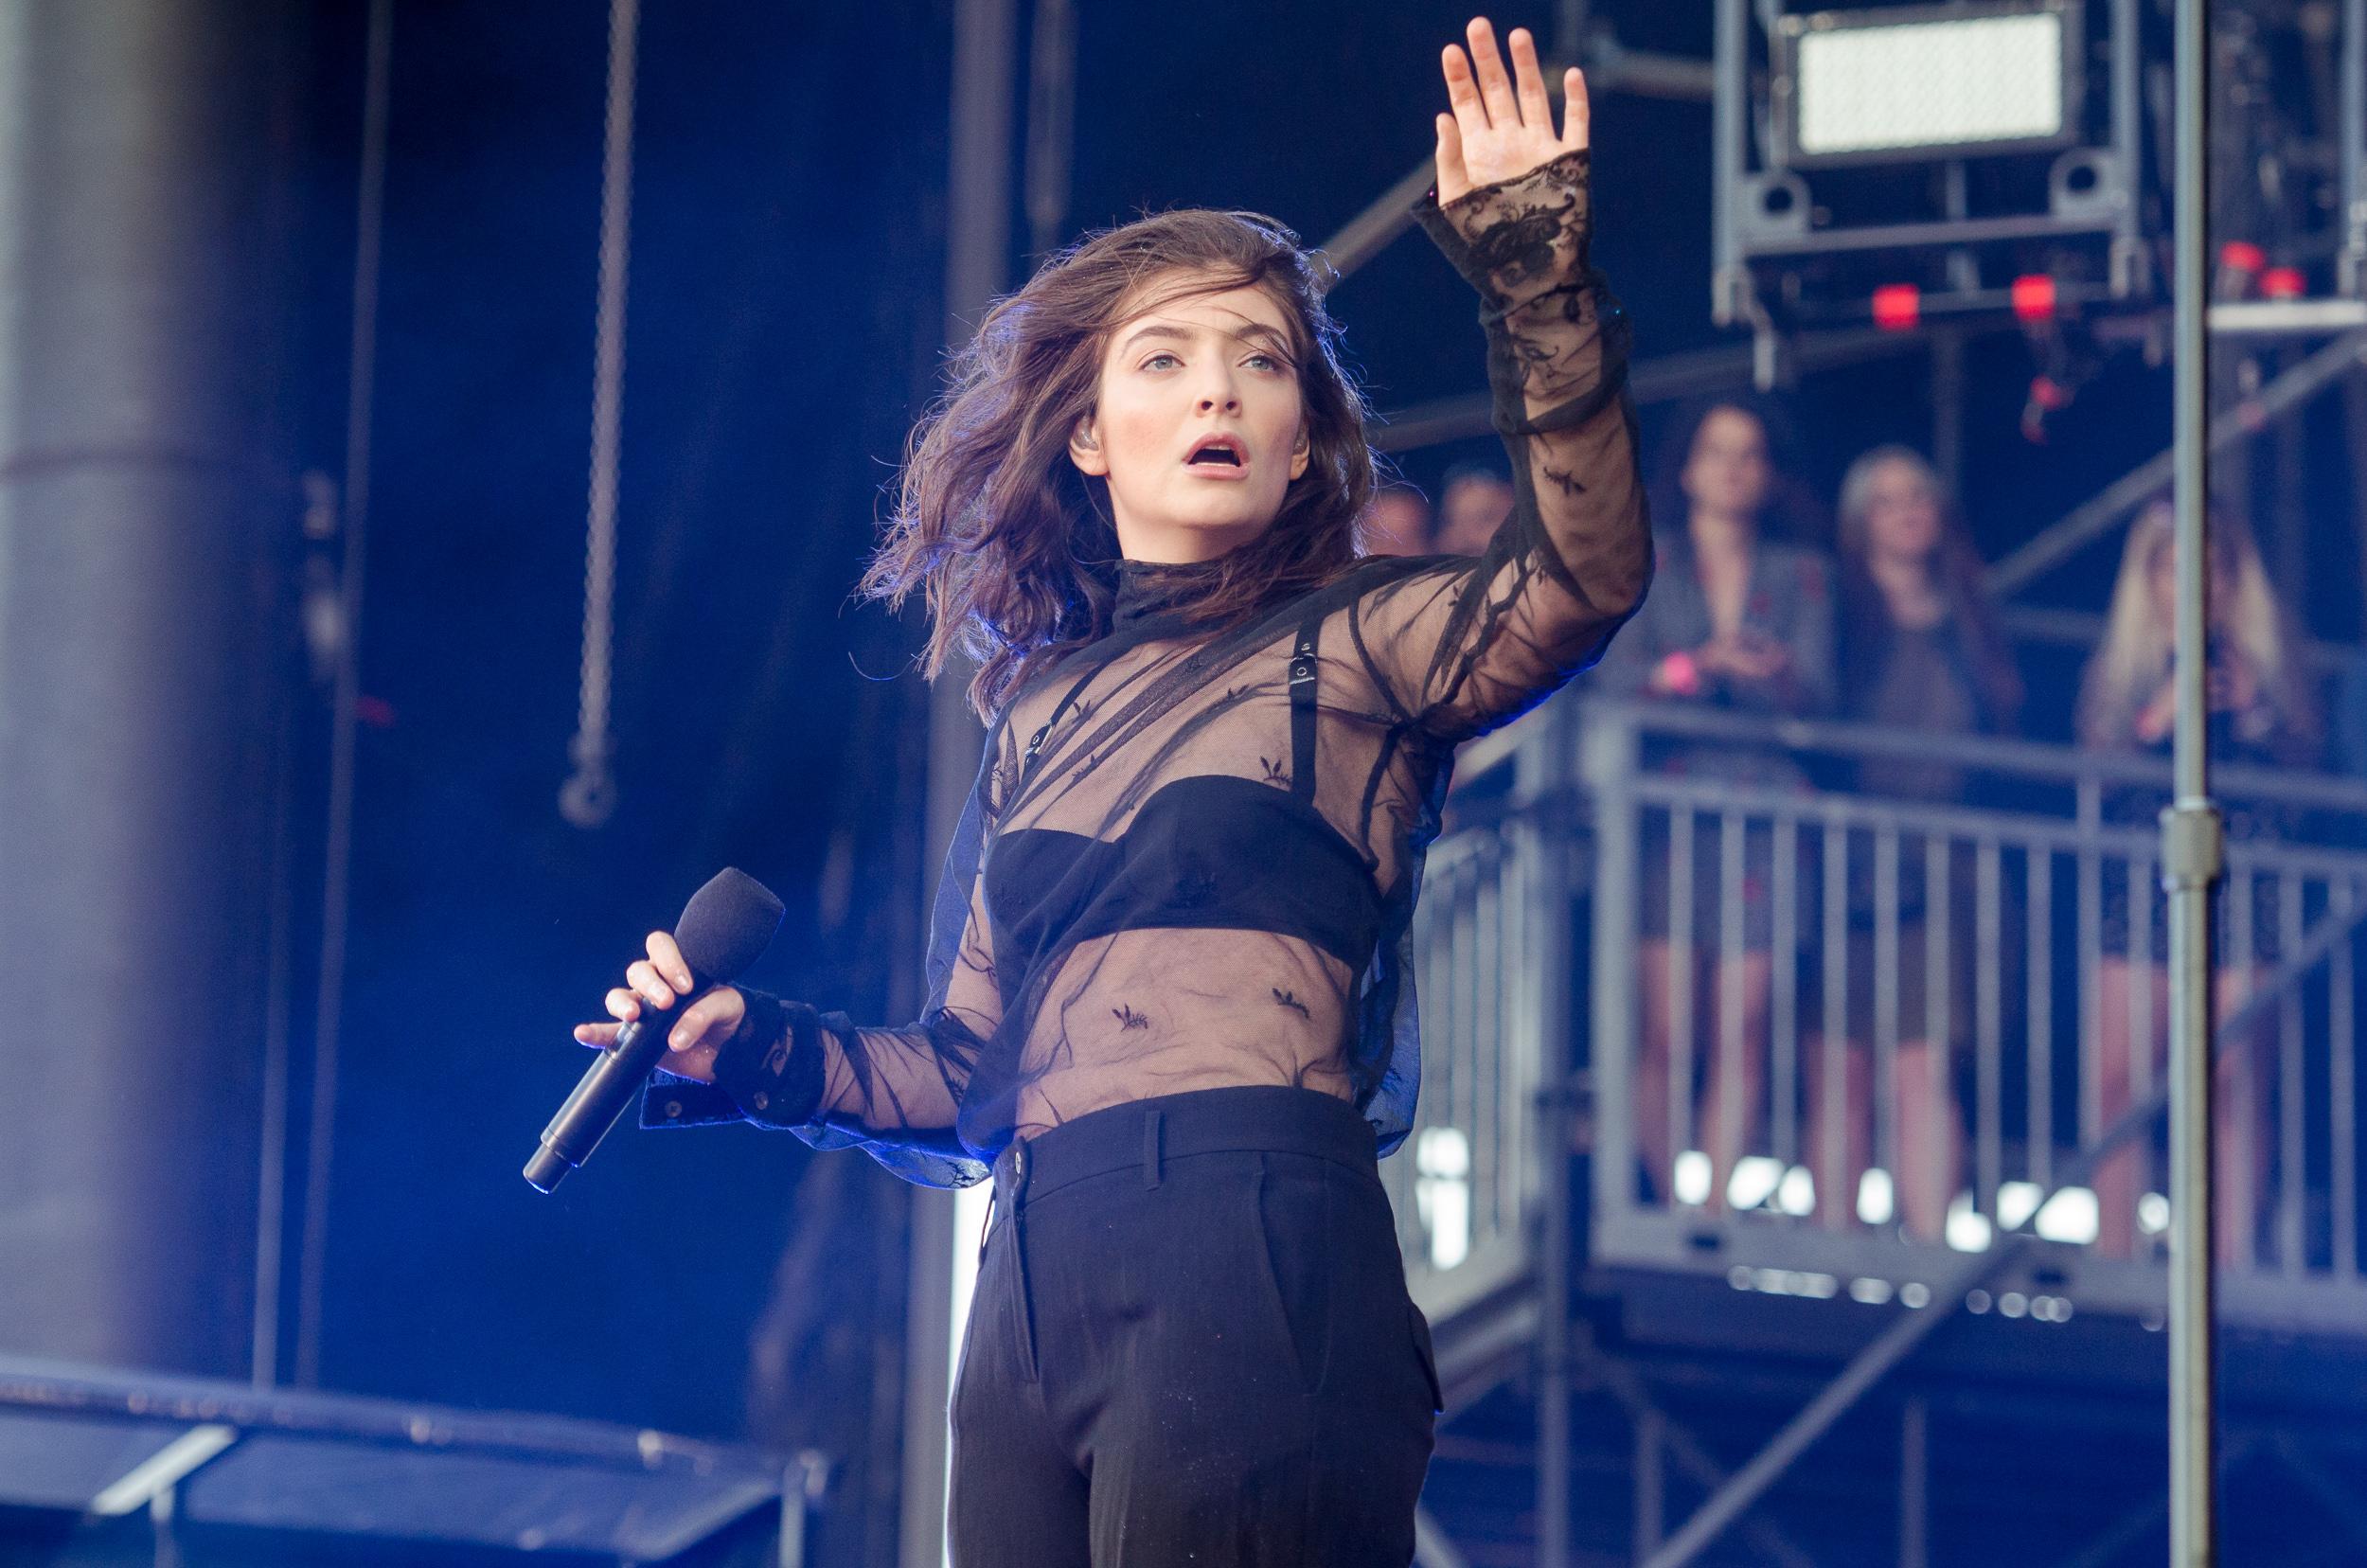 Lorde confirms work on third album